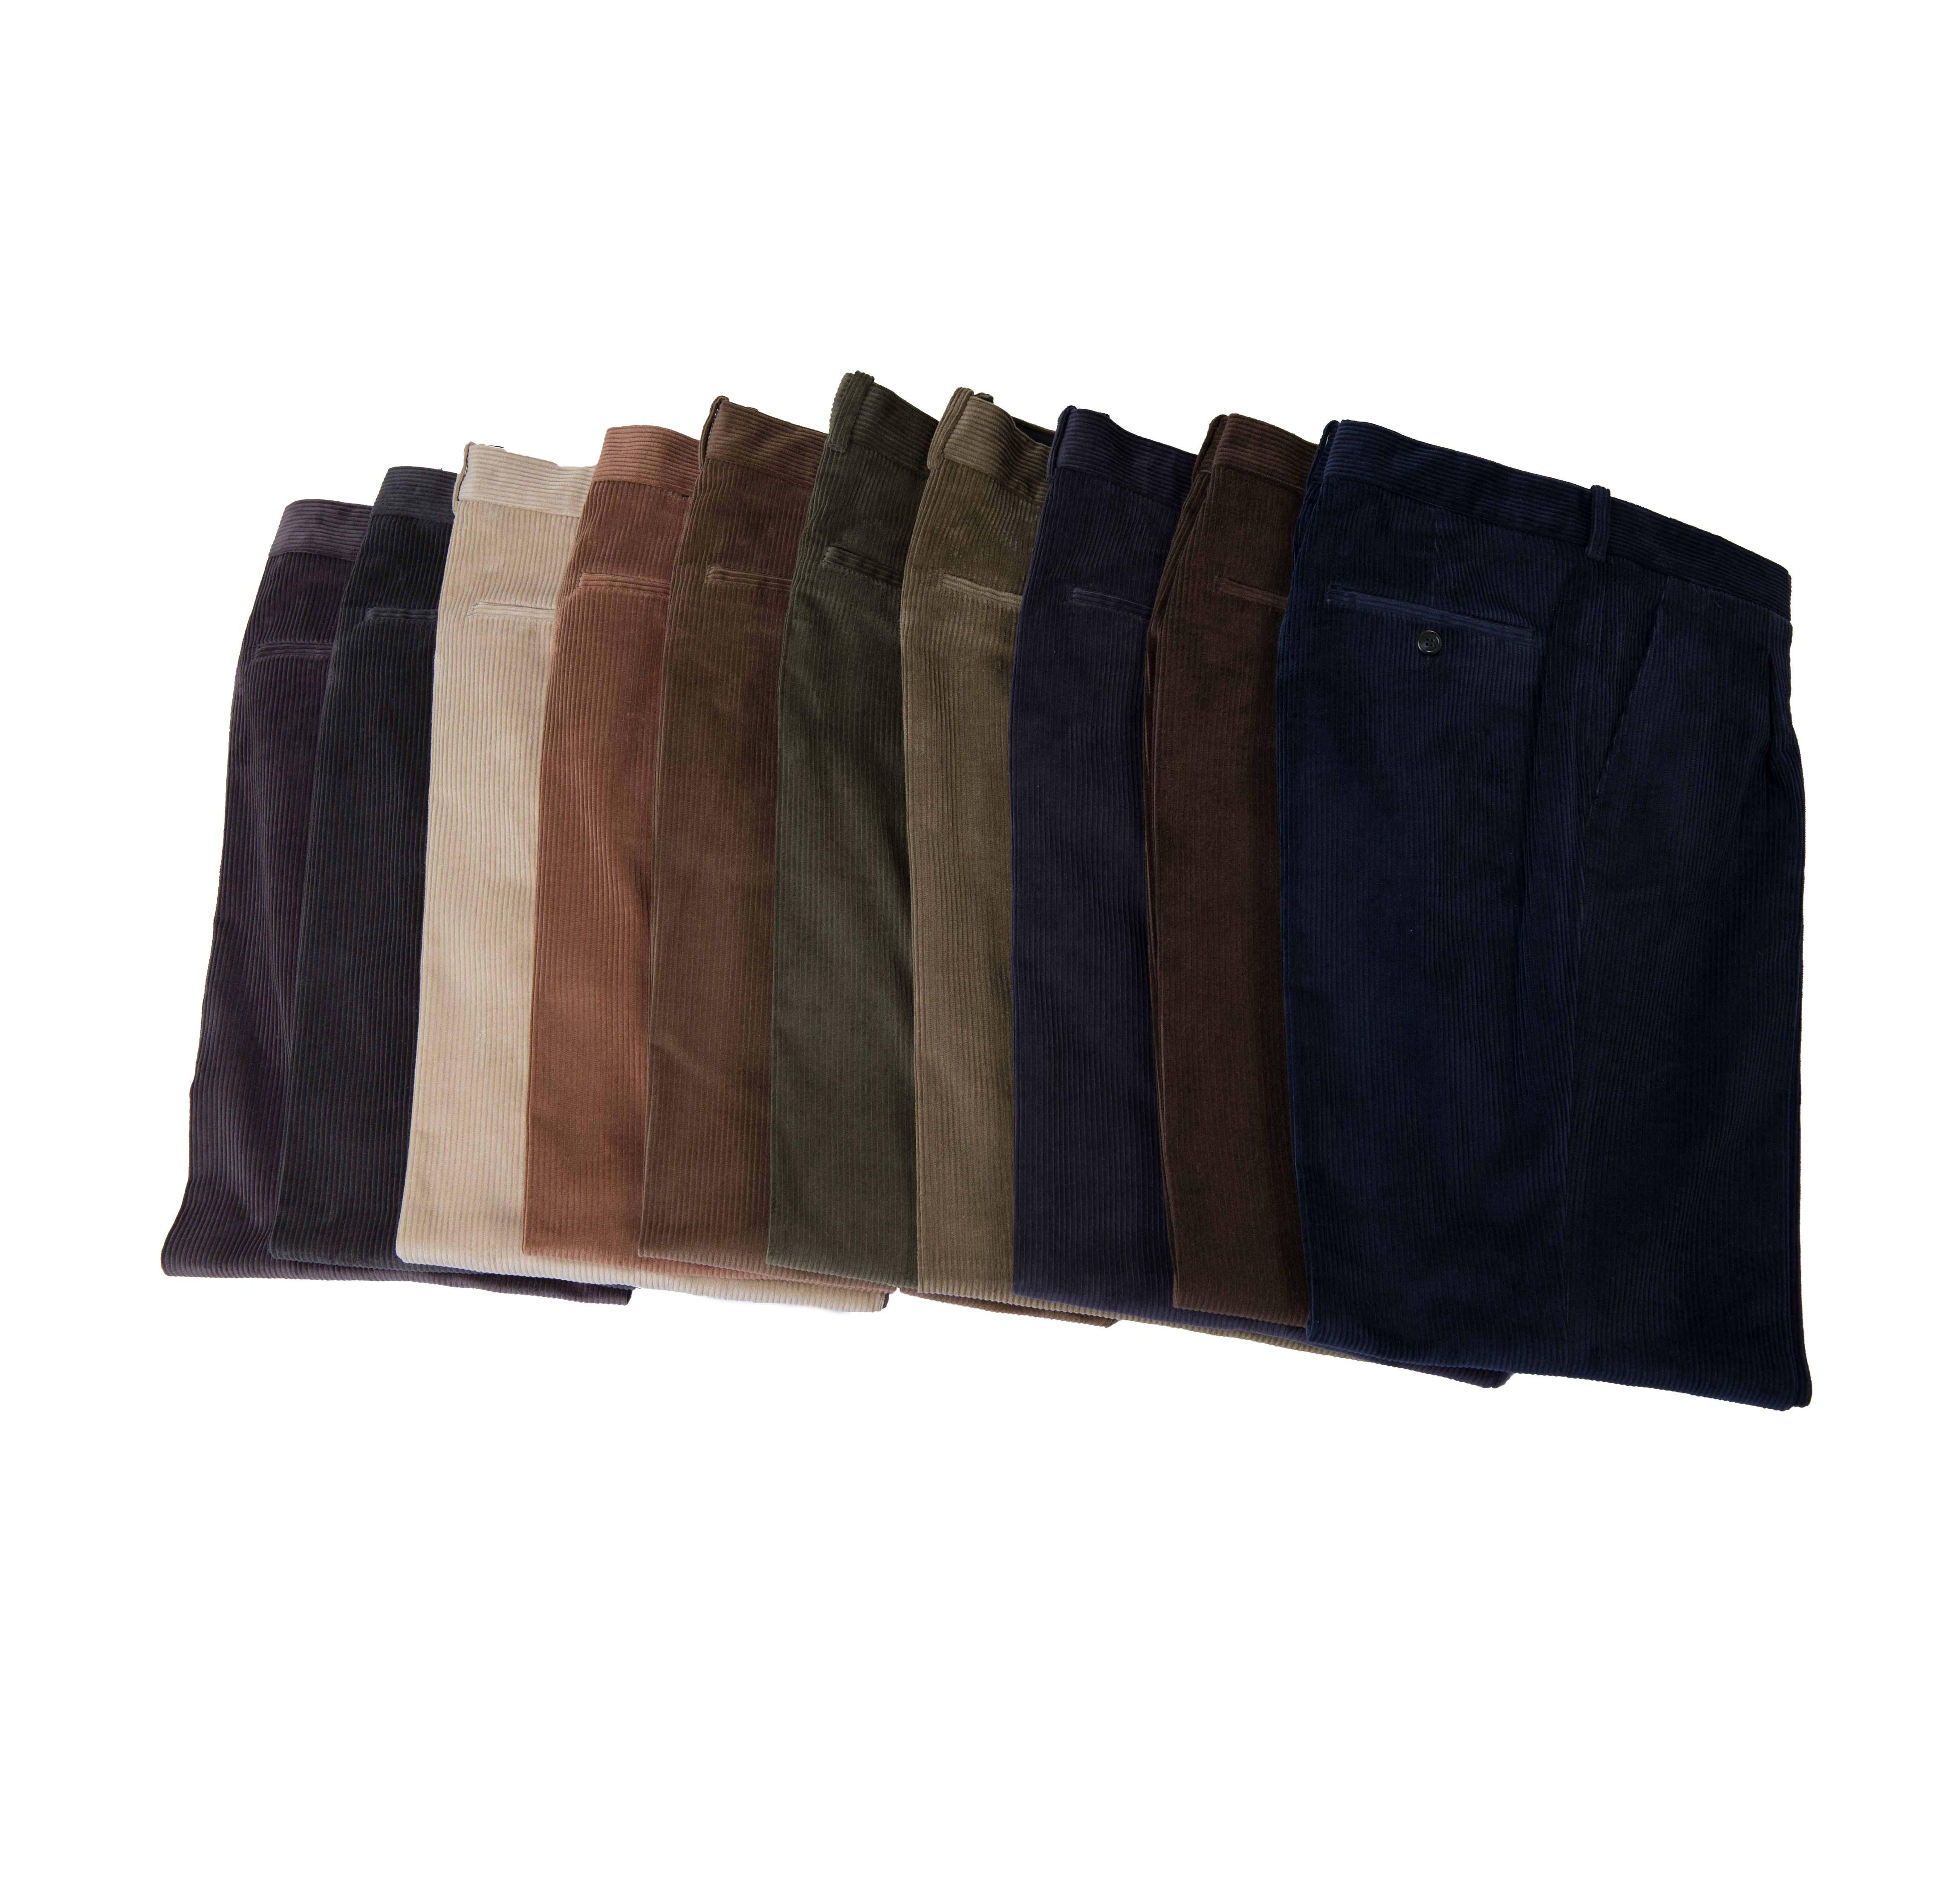 e20453f7d9 Pantalón de pana modelo hombre - Pantalones Blaper